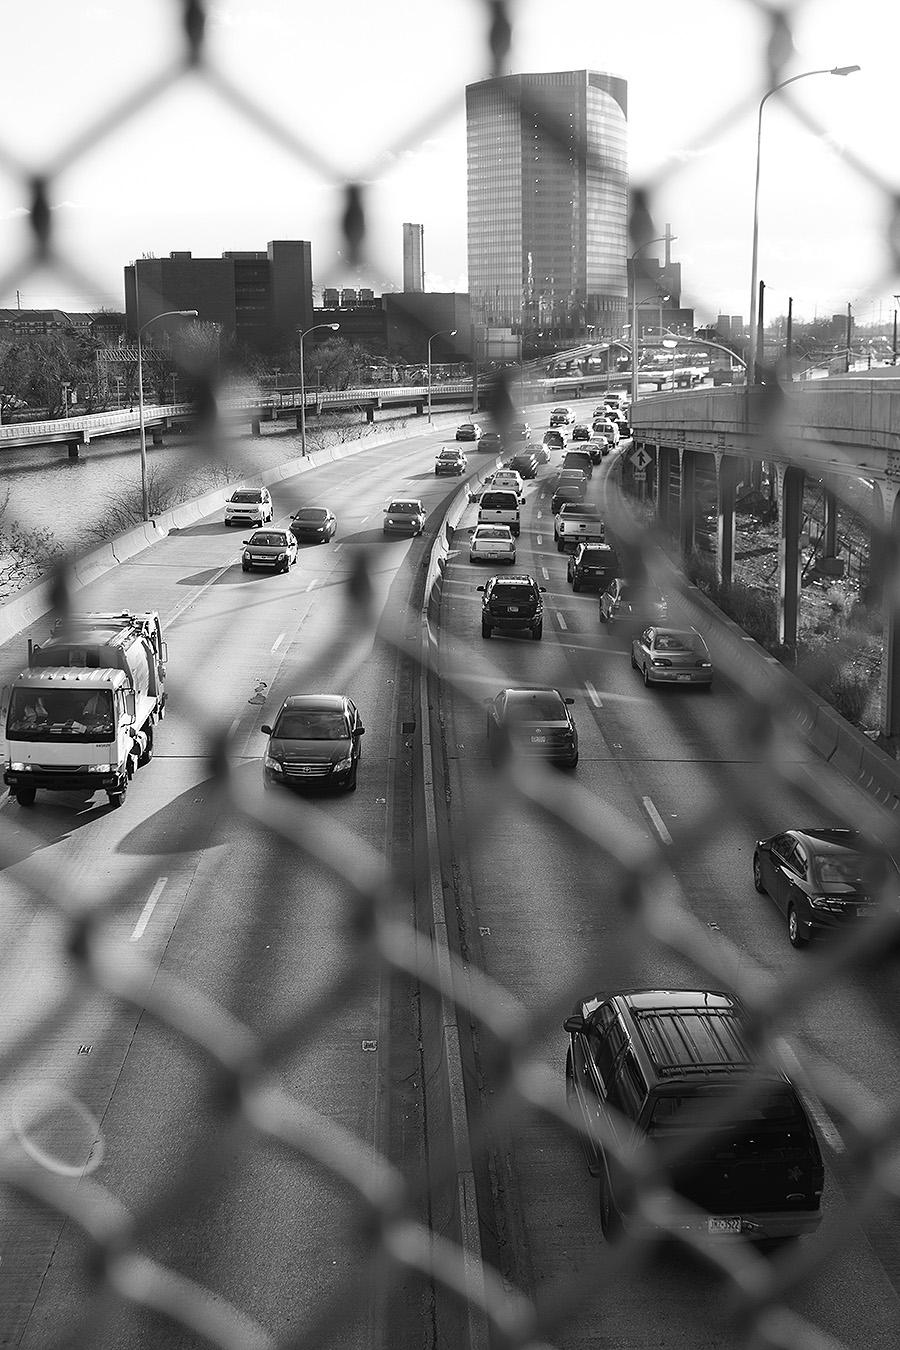 Anni_Liu_Photography_Individual_Project_16_Streets_Cars_Philadelphia_City